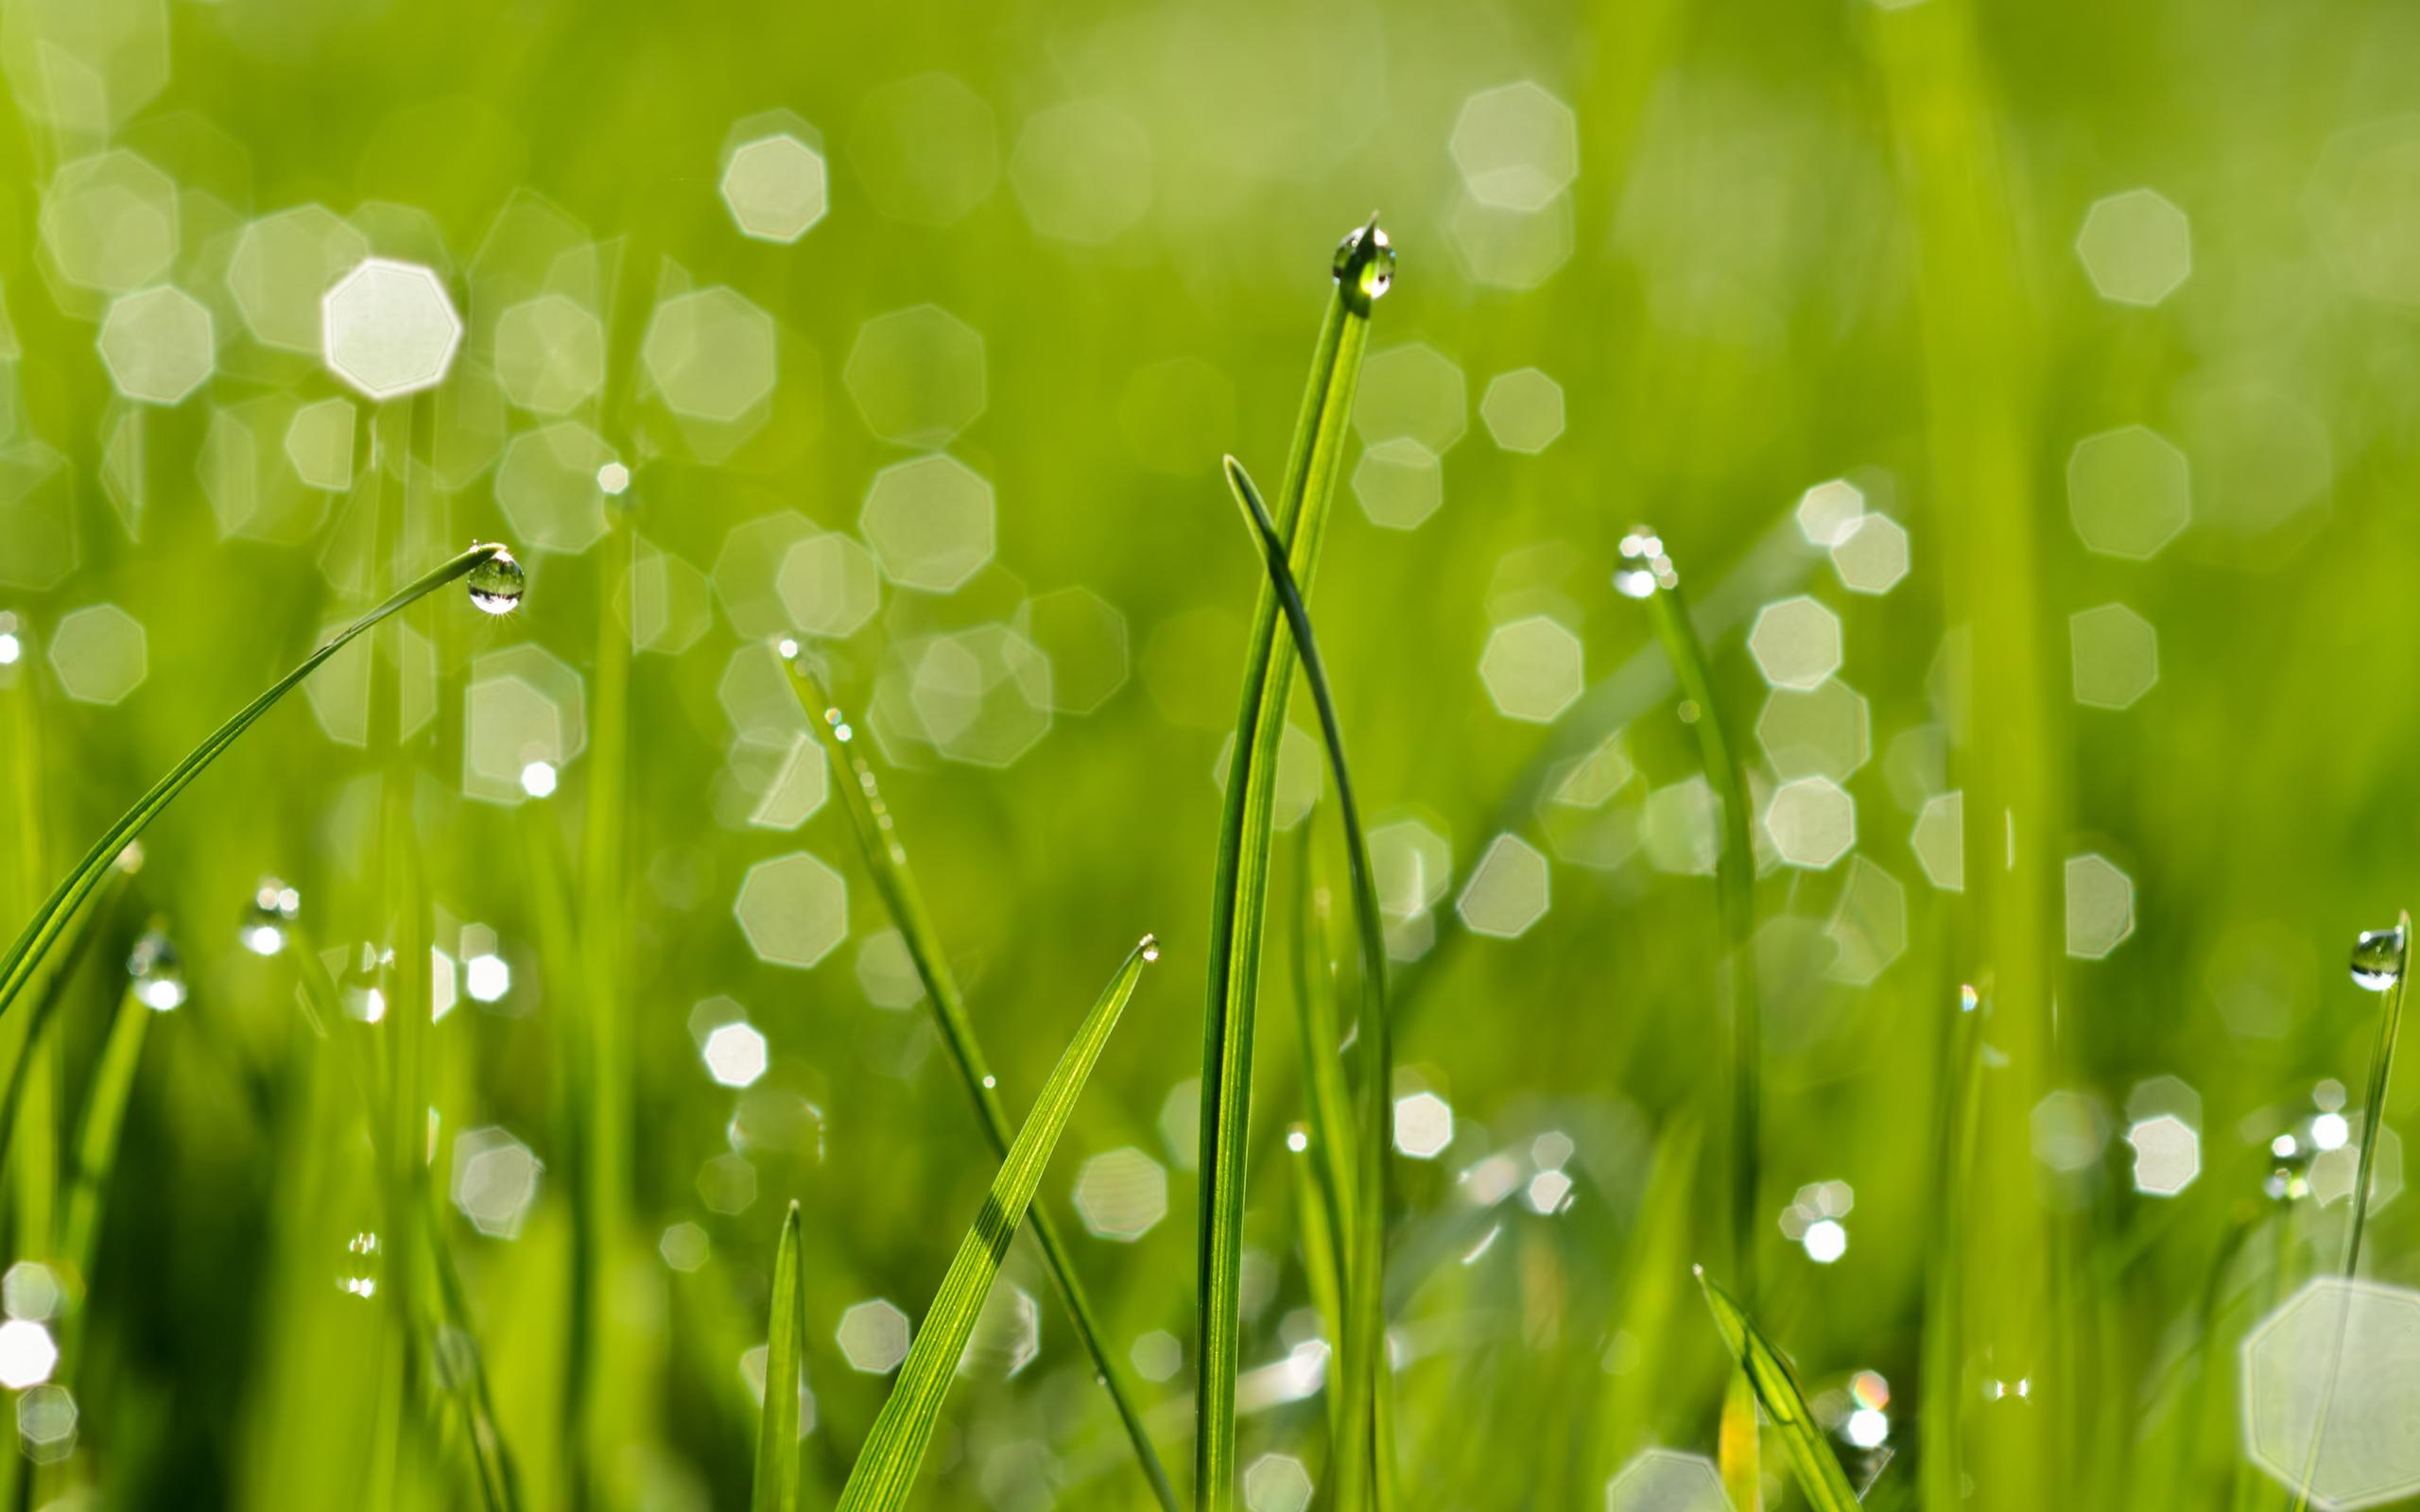 природа роса вода капли макро трава nature Rosa water drops macro grass бесплатно